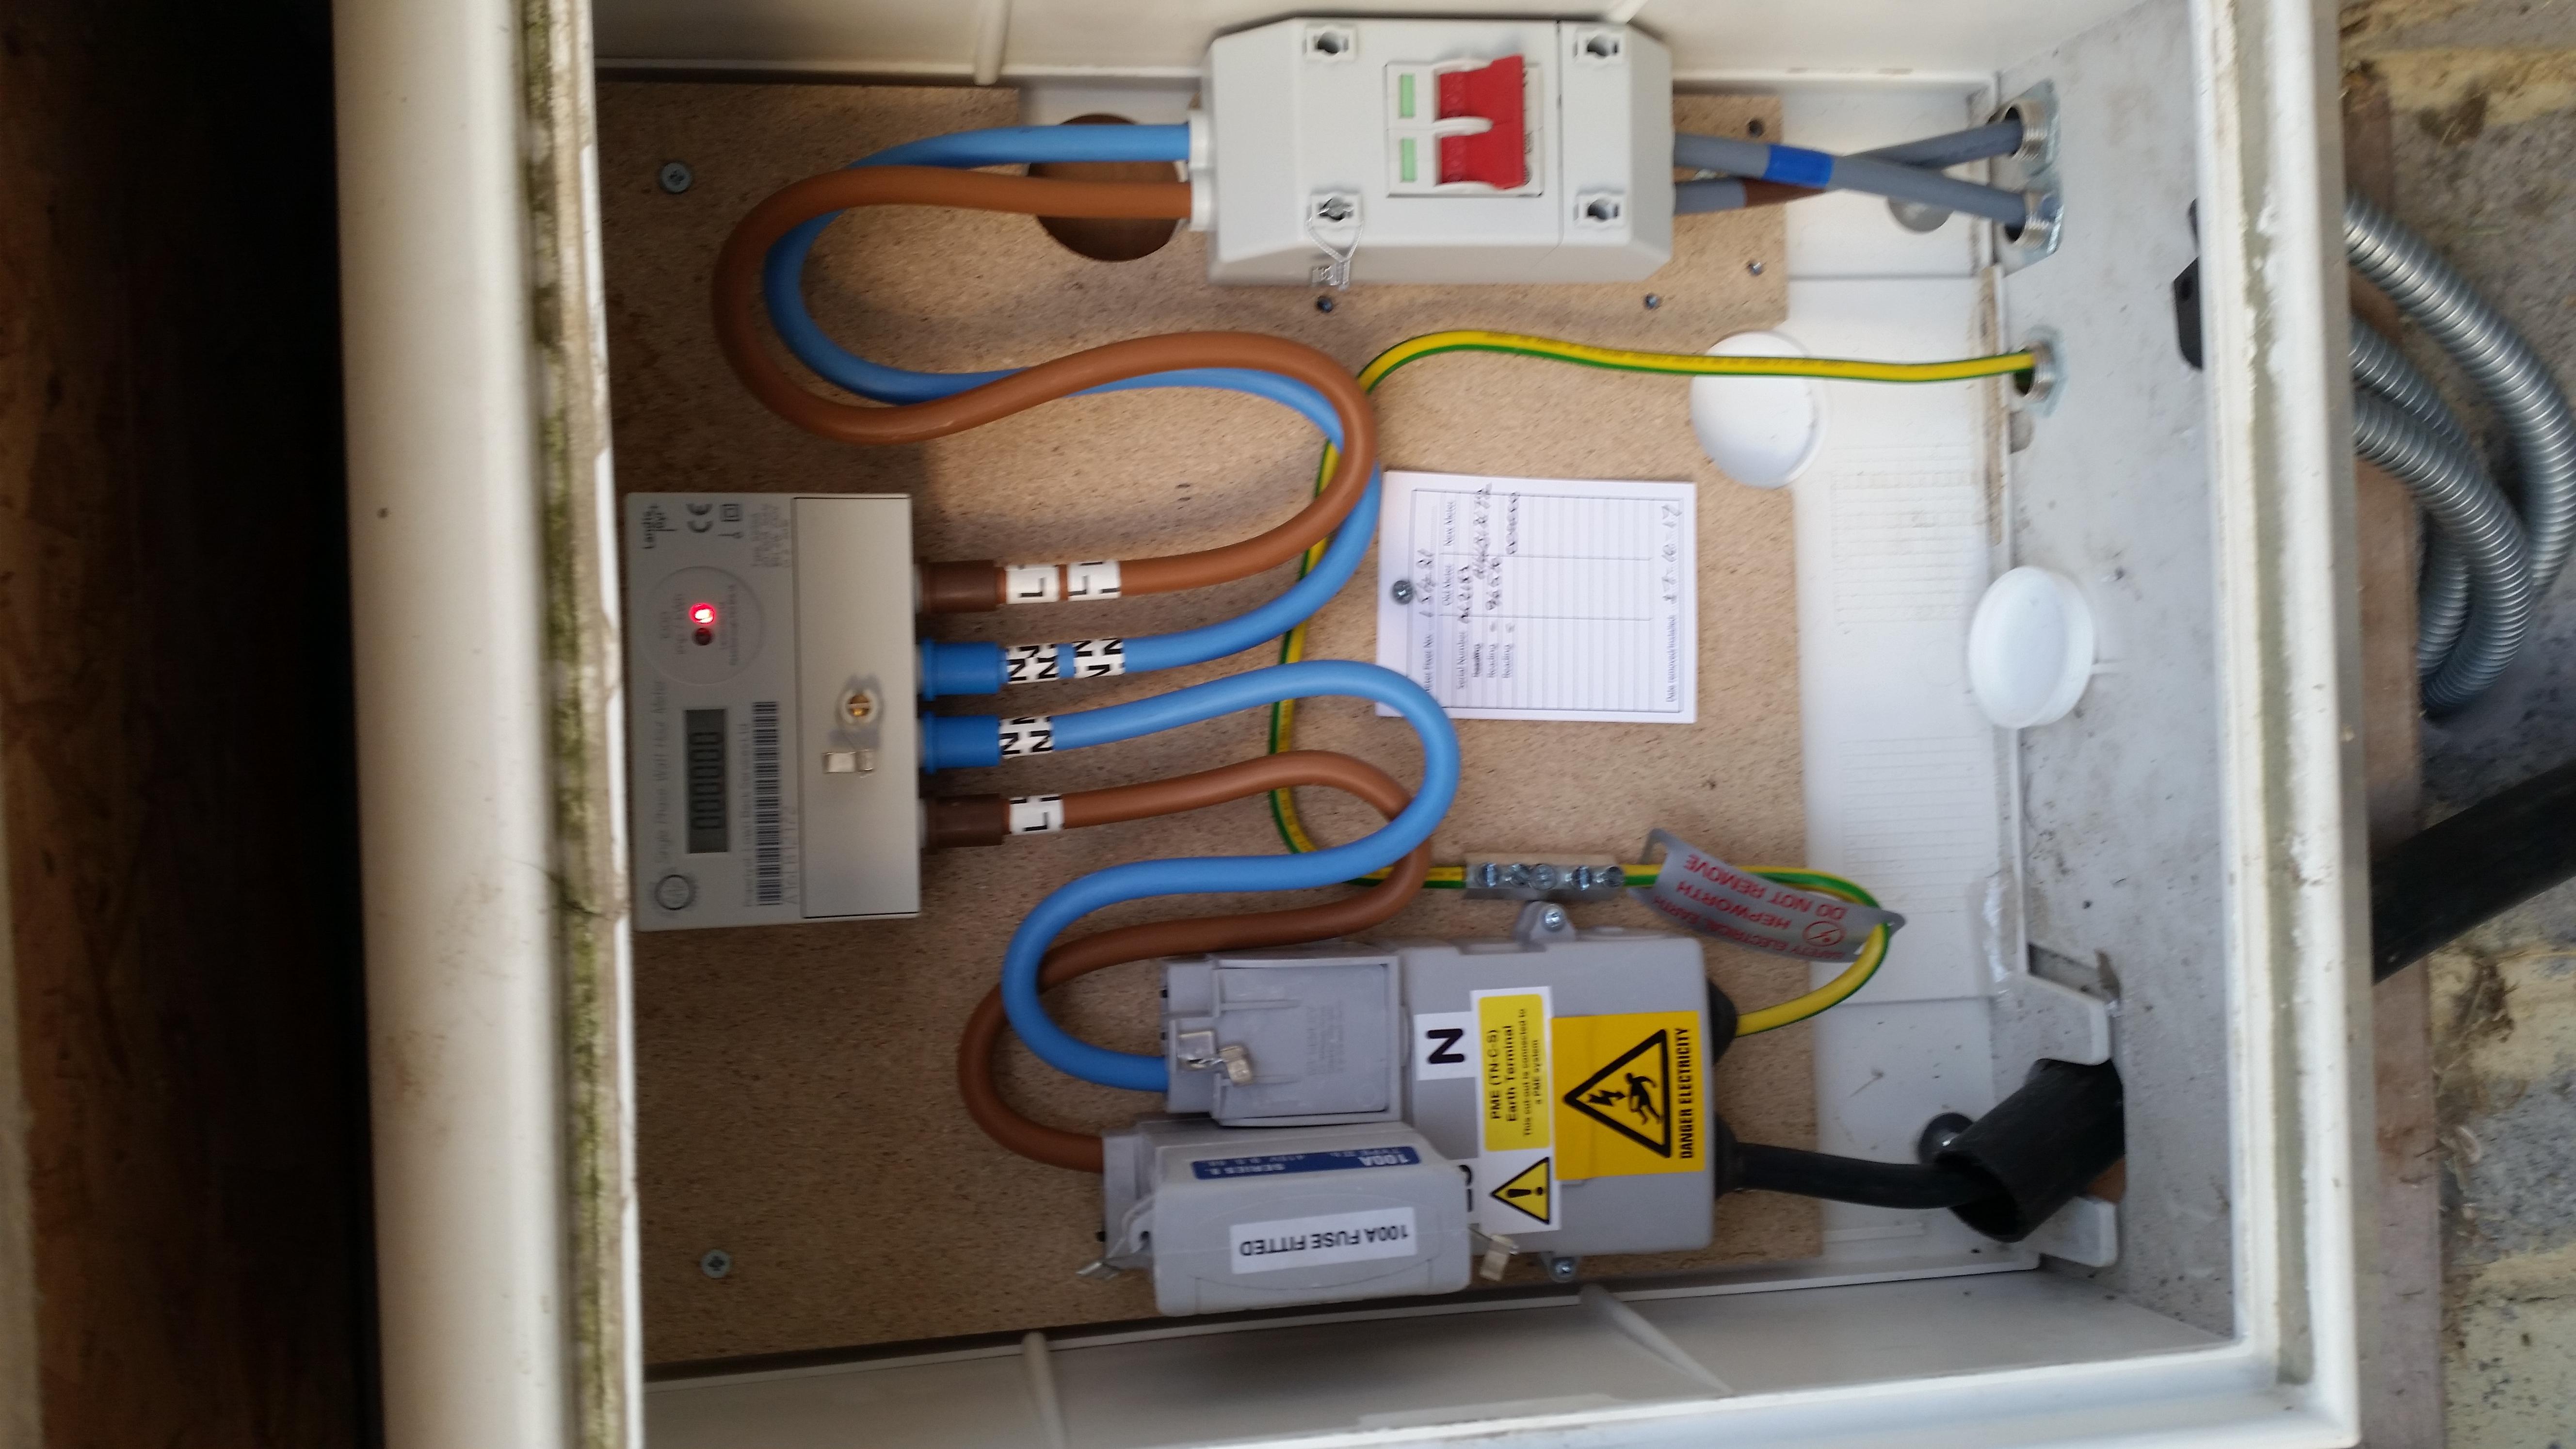 cu where to install it them consumer units rcds mcbos rh forum buildhub org uk